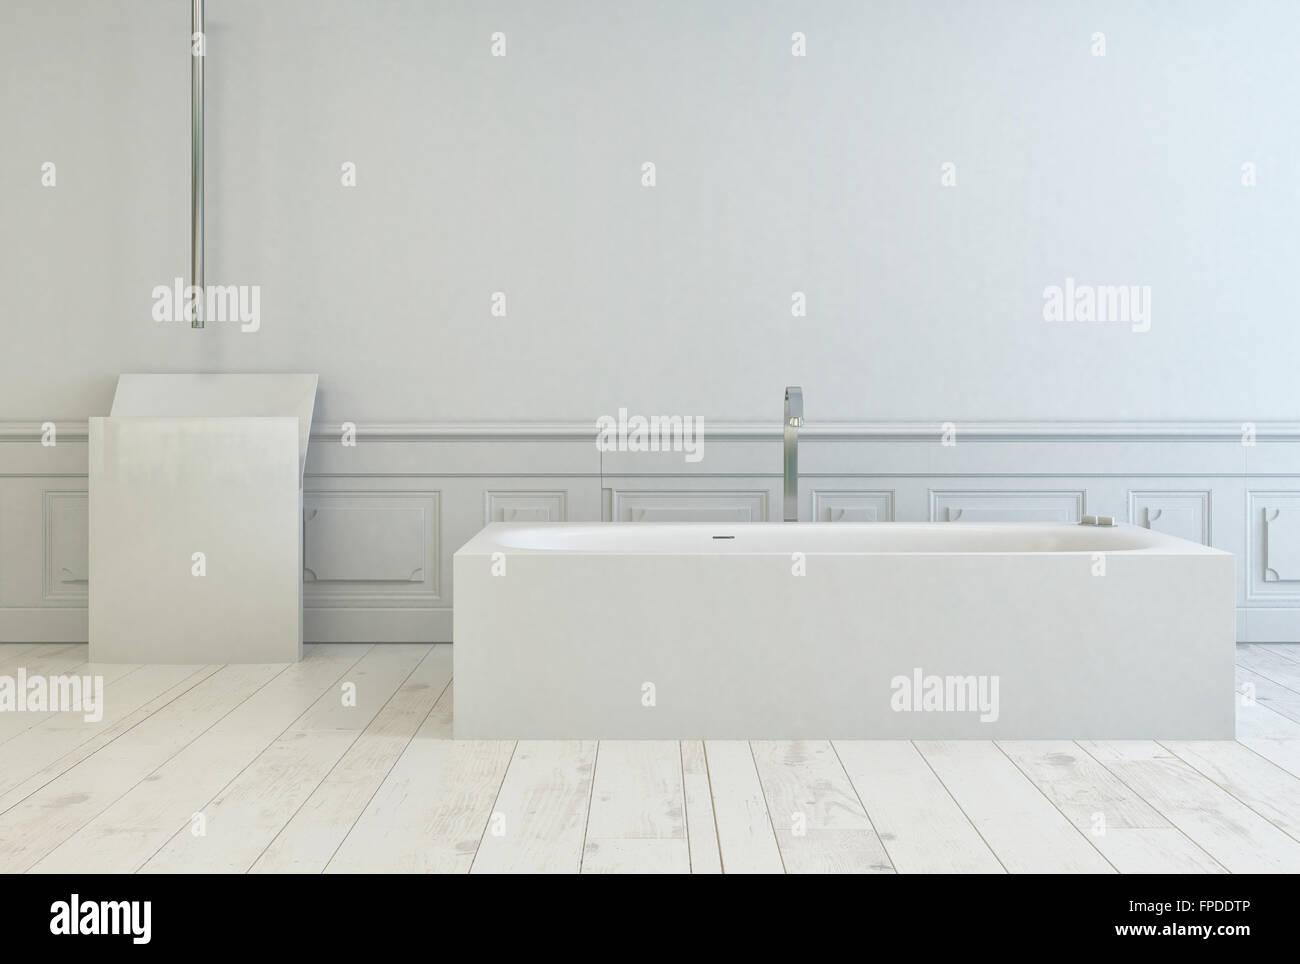 Vasca Da Bagno Semplice : Semplice bianco rettangolare vasca da bagno in un bagno bianco per